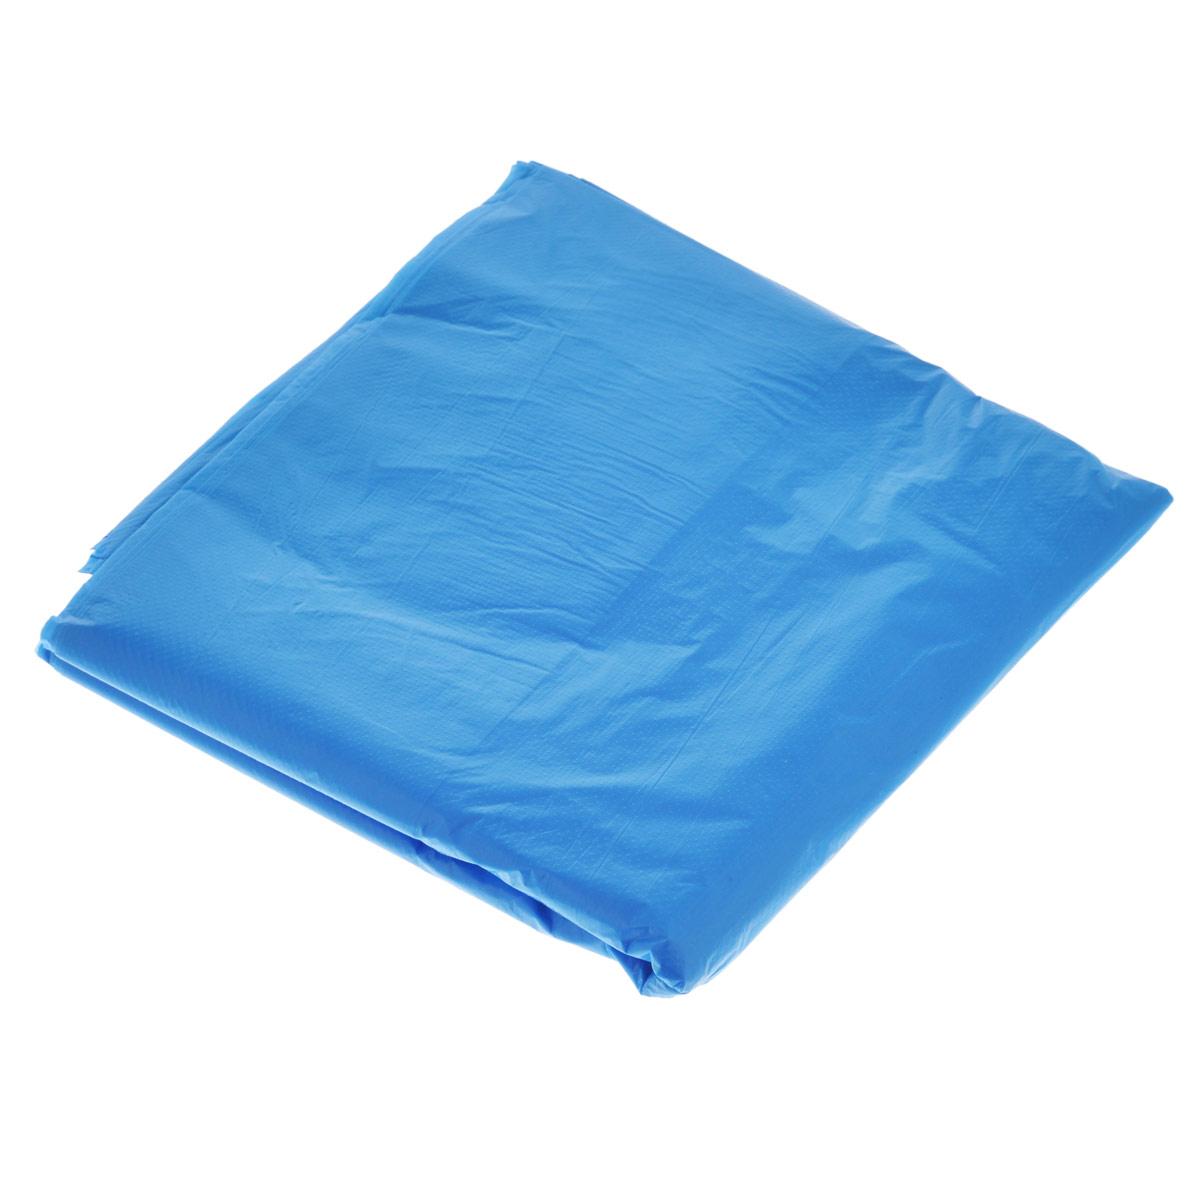 Пакеты для мусора La Chista, с ручками, 35 л, 25 шт пакеты для мусора хозяюшка мила с завязками 35 л 15 шт